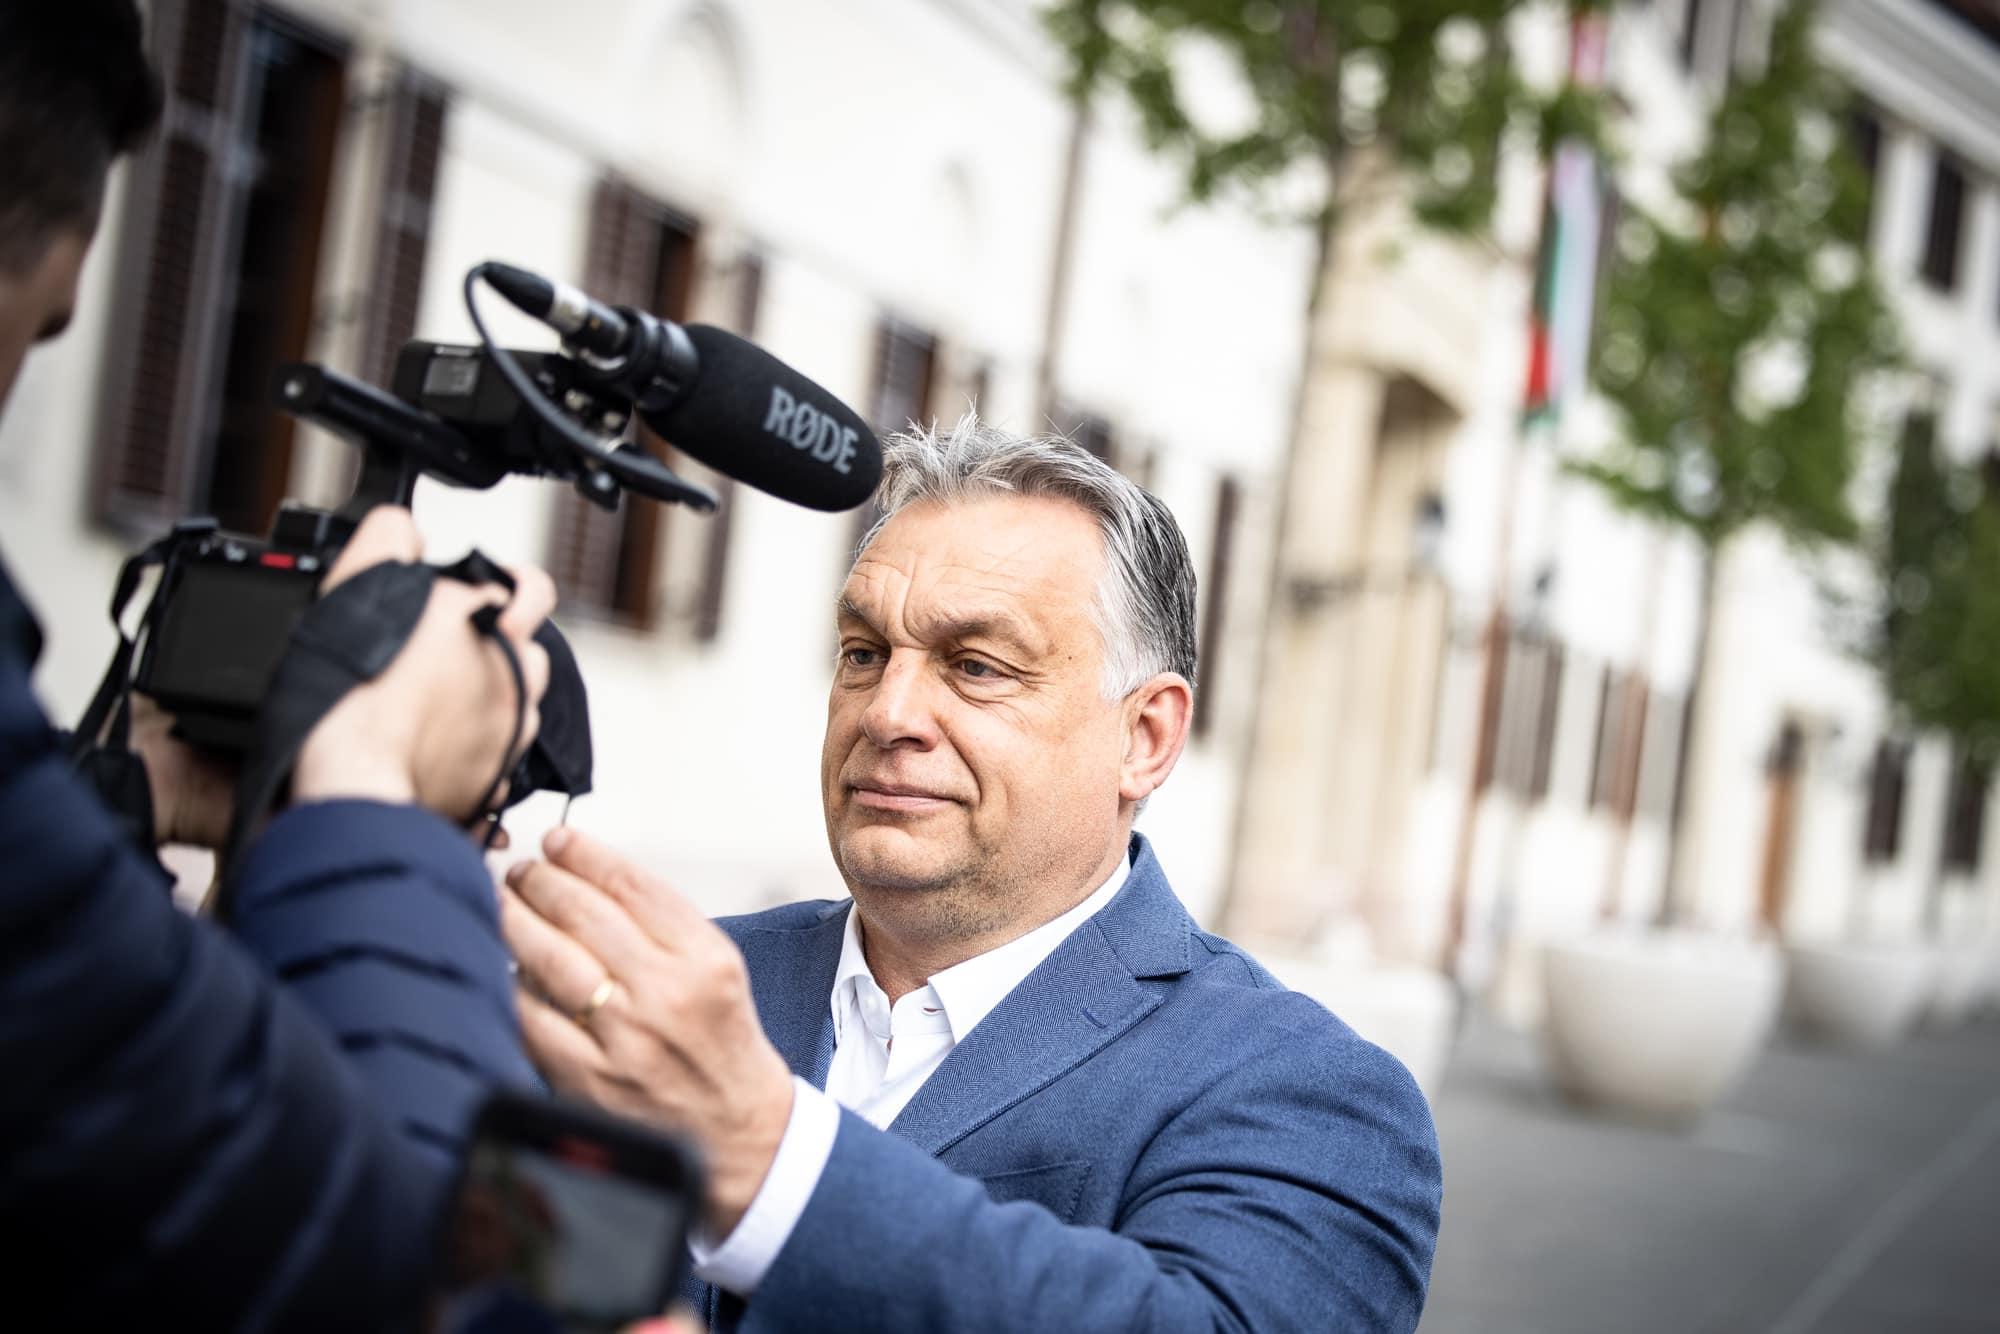 orbán with camera